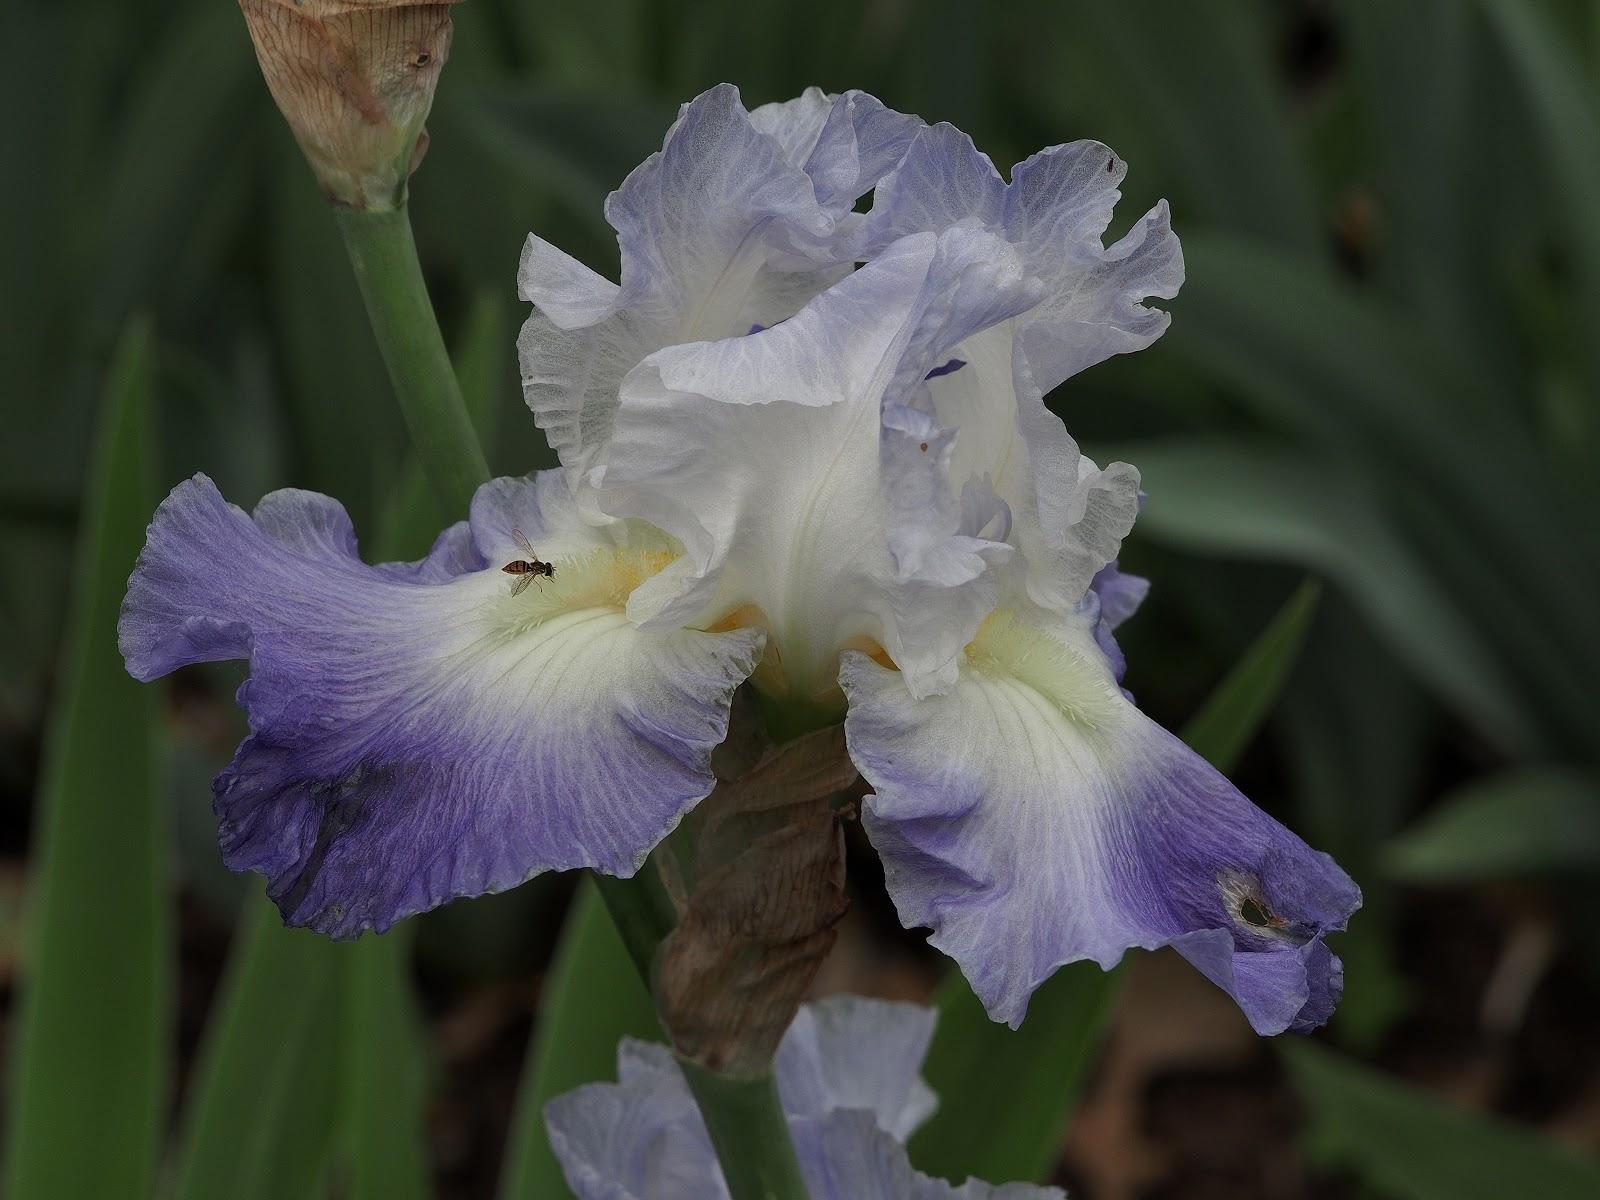 Gathering Nectar, #iris #lavendarandwhite #bearded #flower #flowerpower #elizabethpark #hartfordct